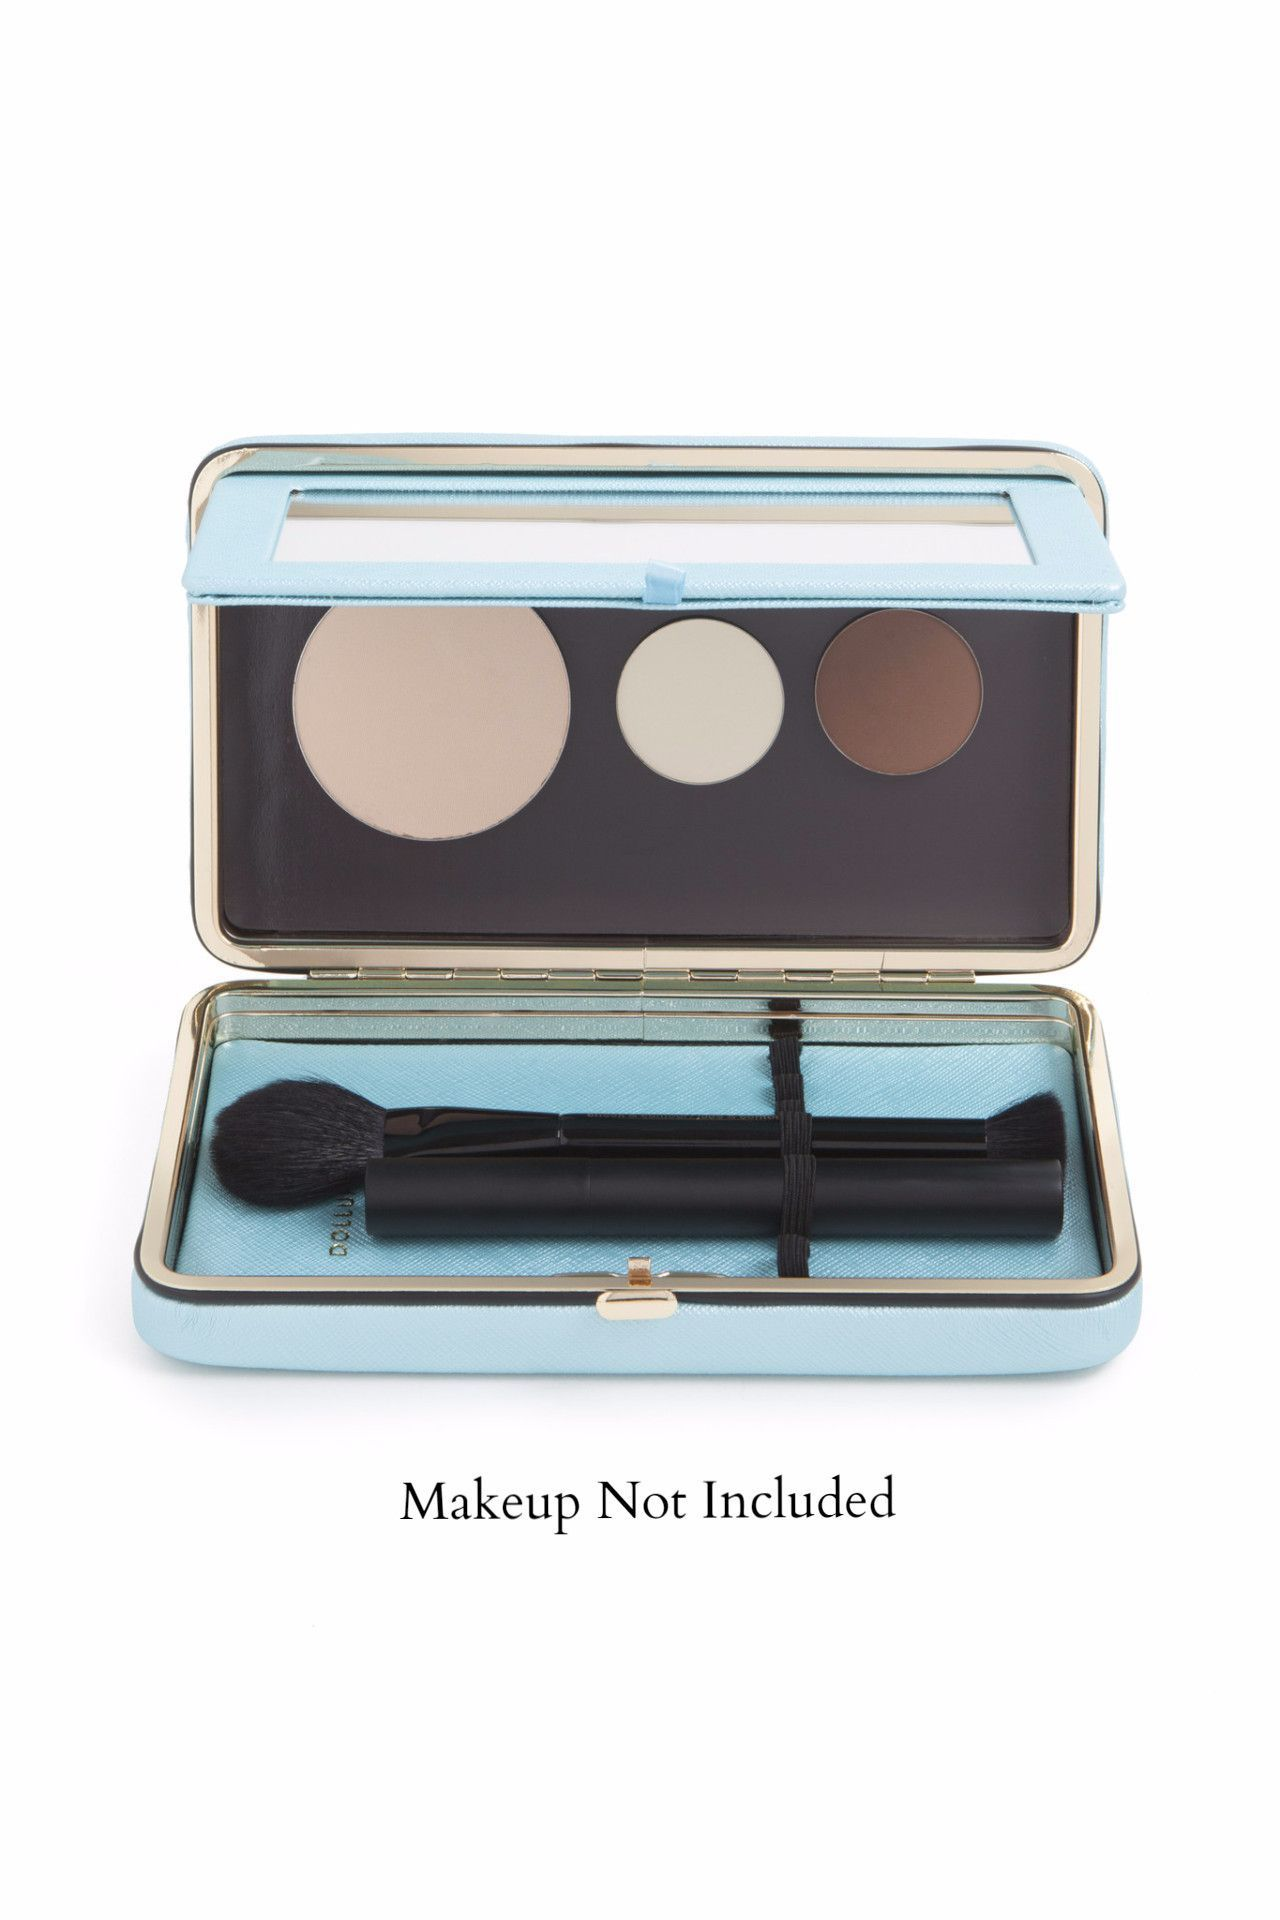 Dollup Case Makeup Organizer W Empty Magnetic Palette In Mintea